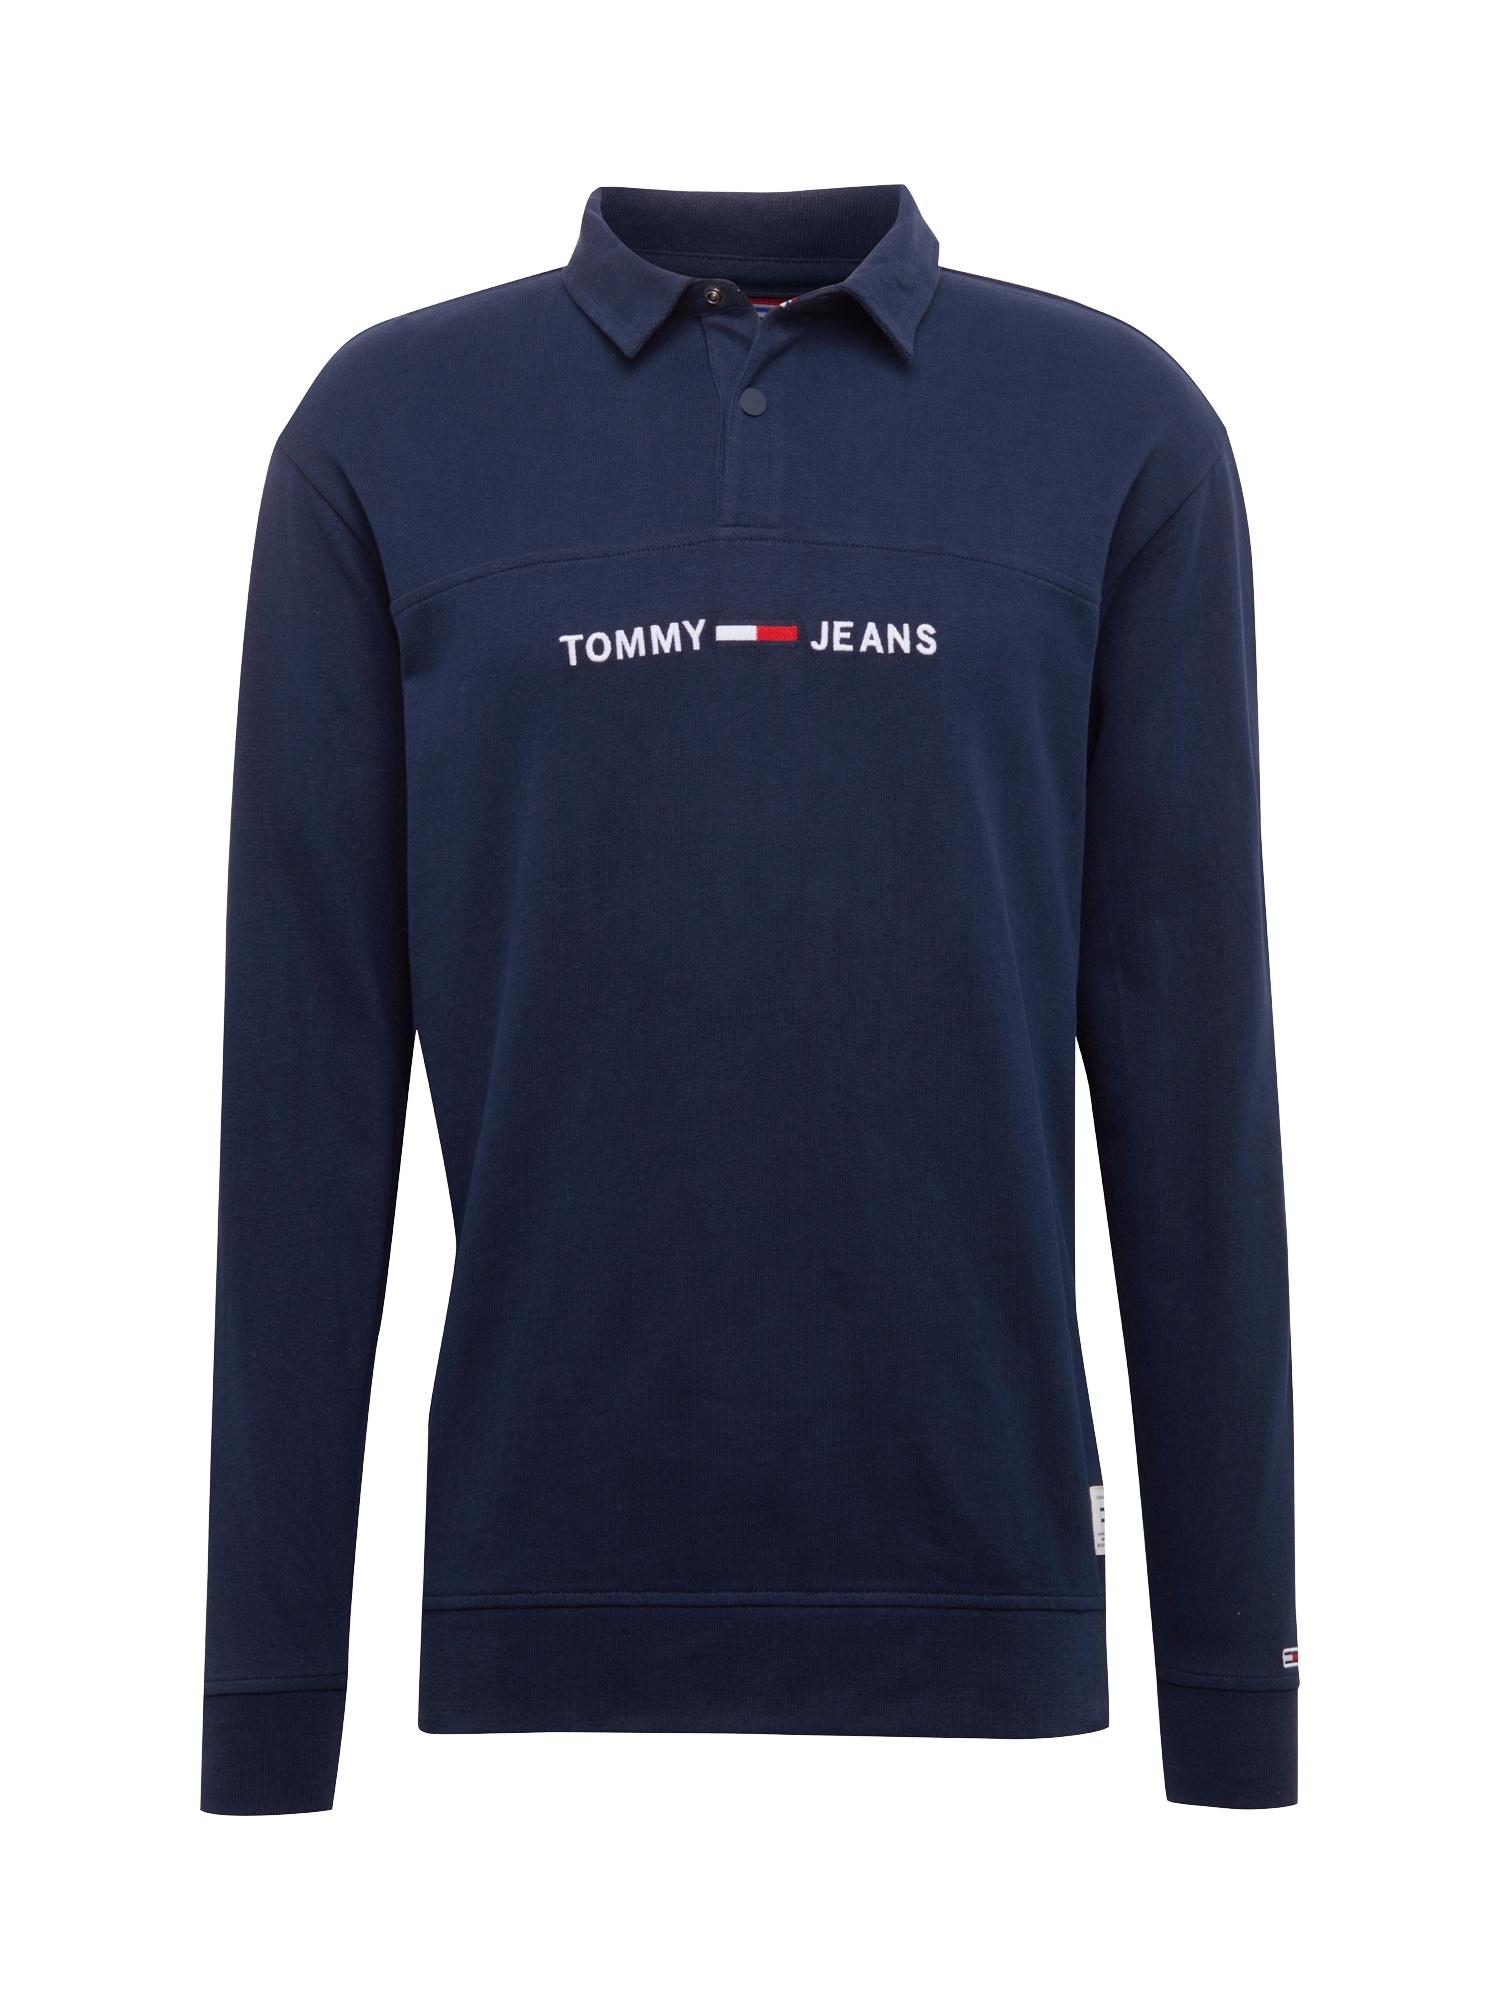 Mikina TJM ESSENTIAL RUGBY SHIRT tmavě modrá červená bílá Tommy Jeans